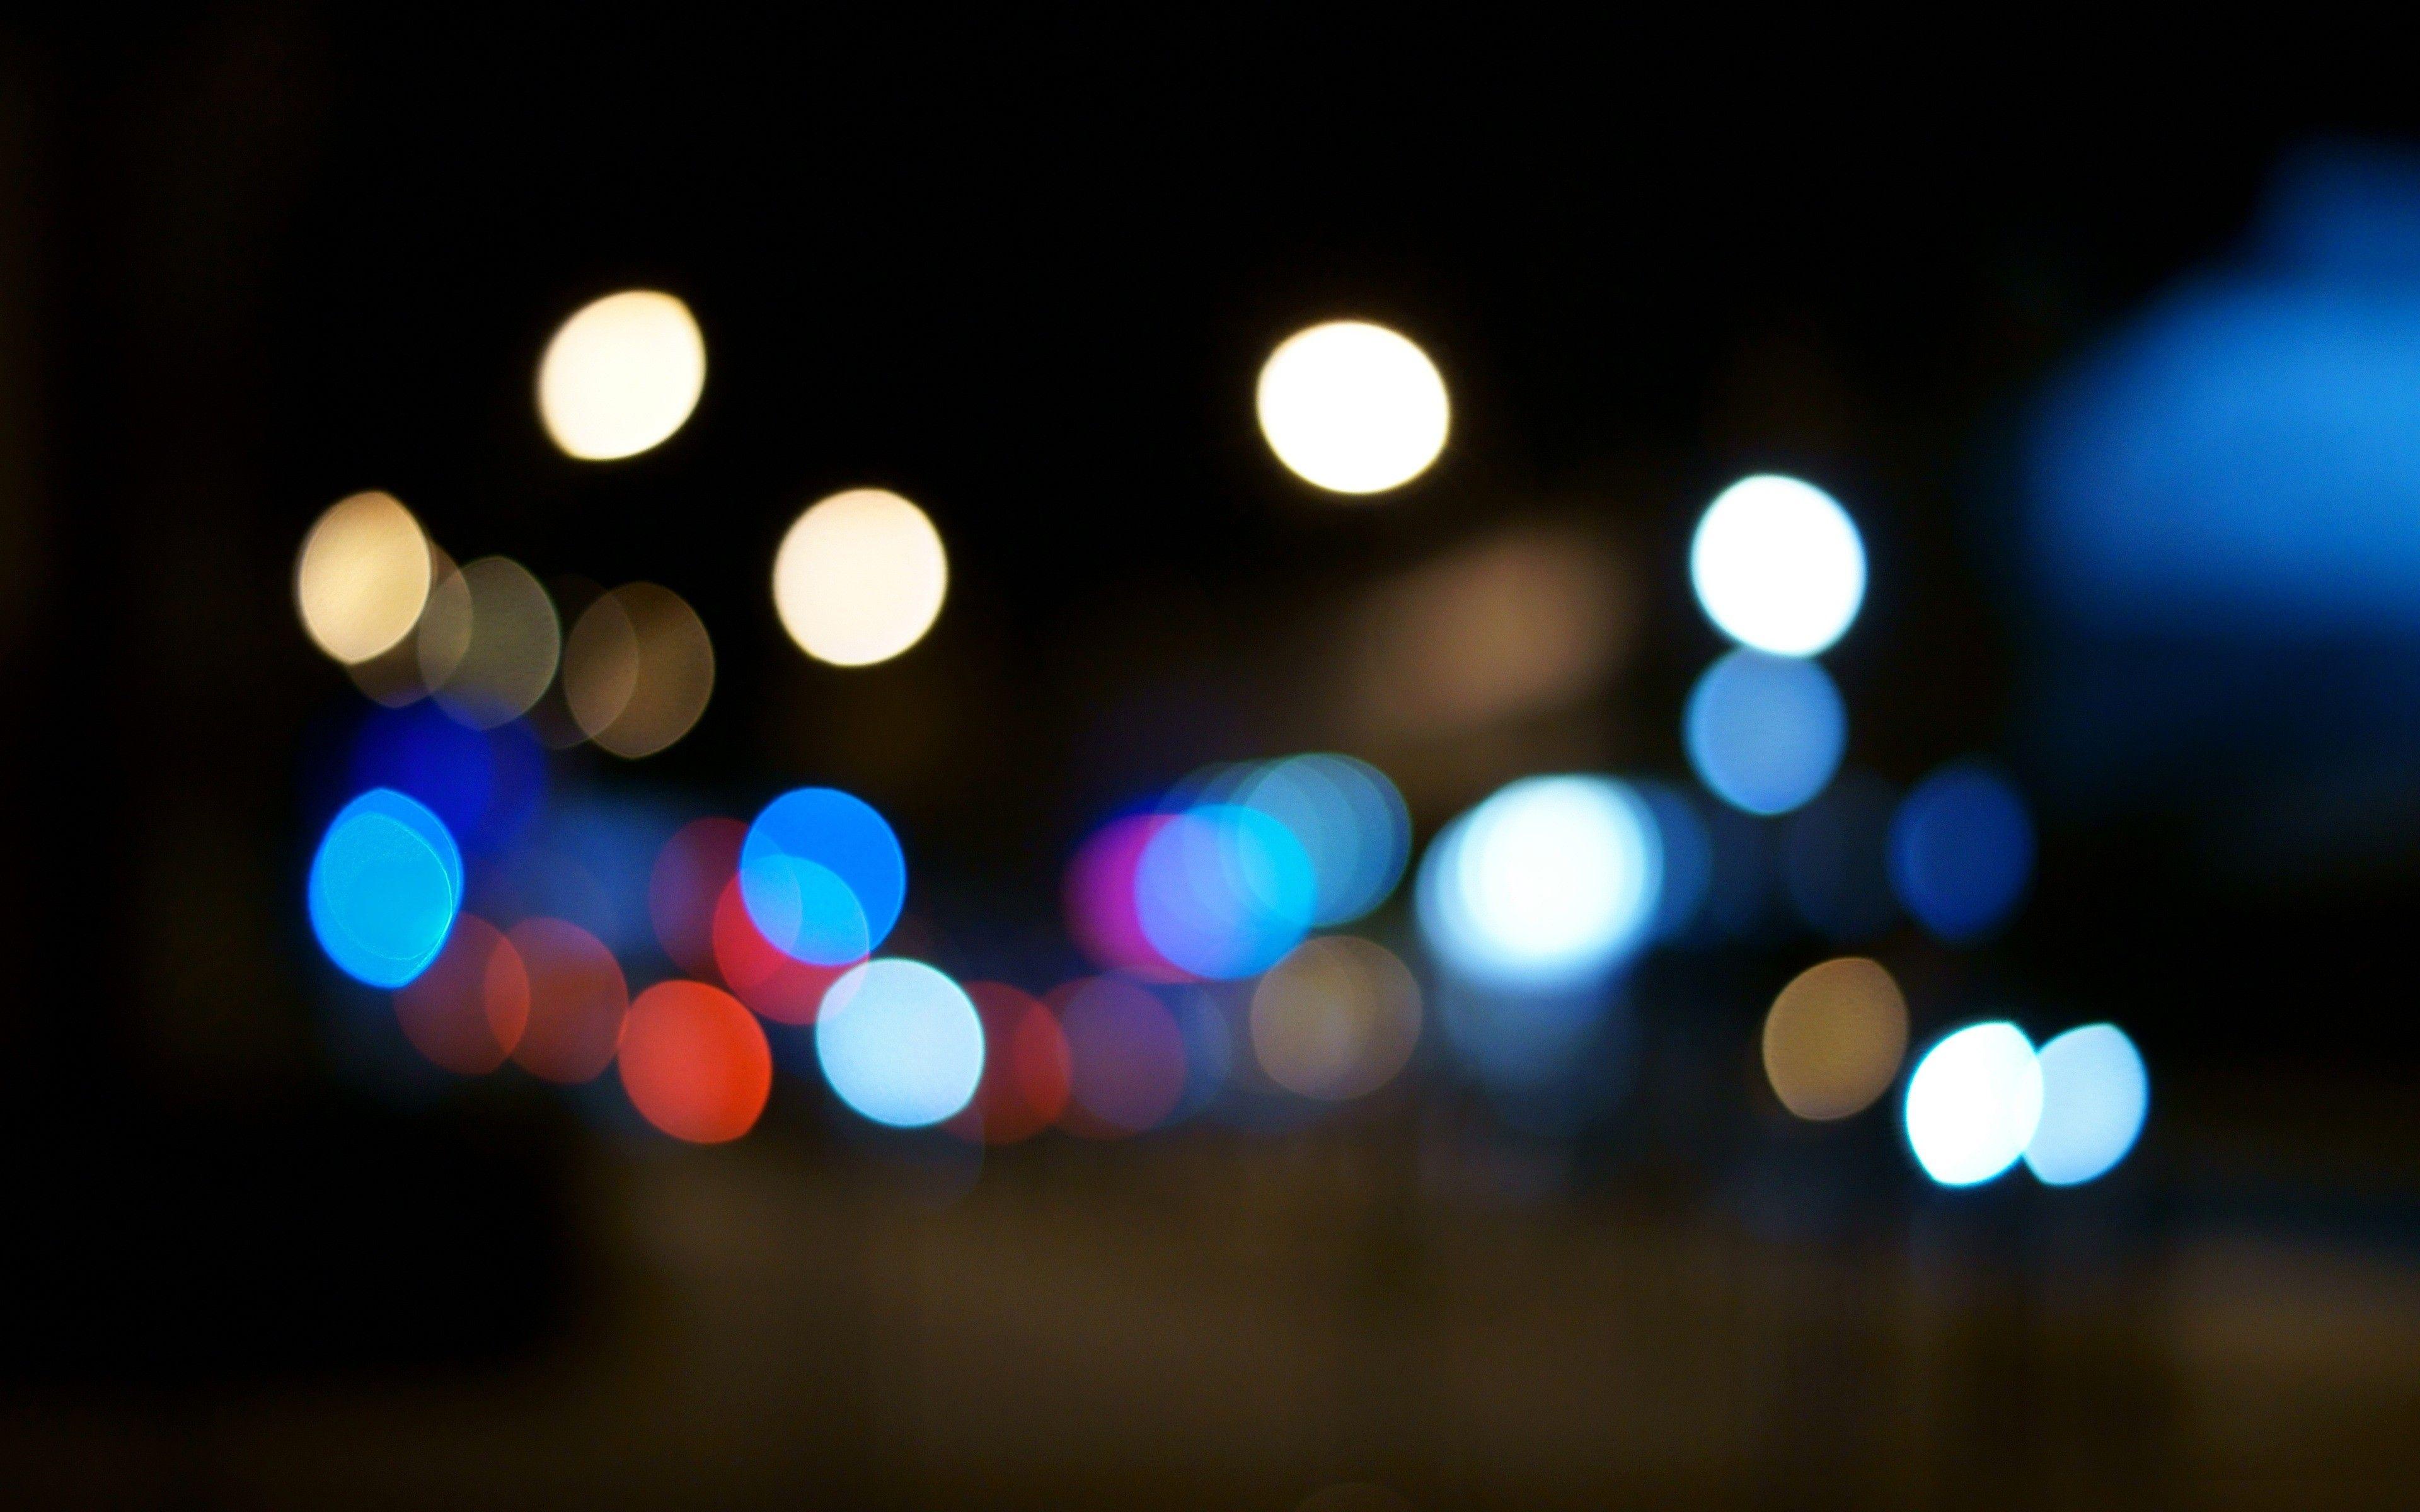 Night Bokeh Light Bulbs Orbs Out Of Focus